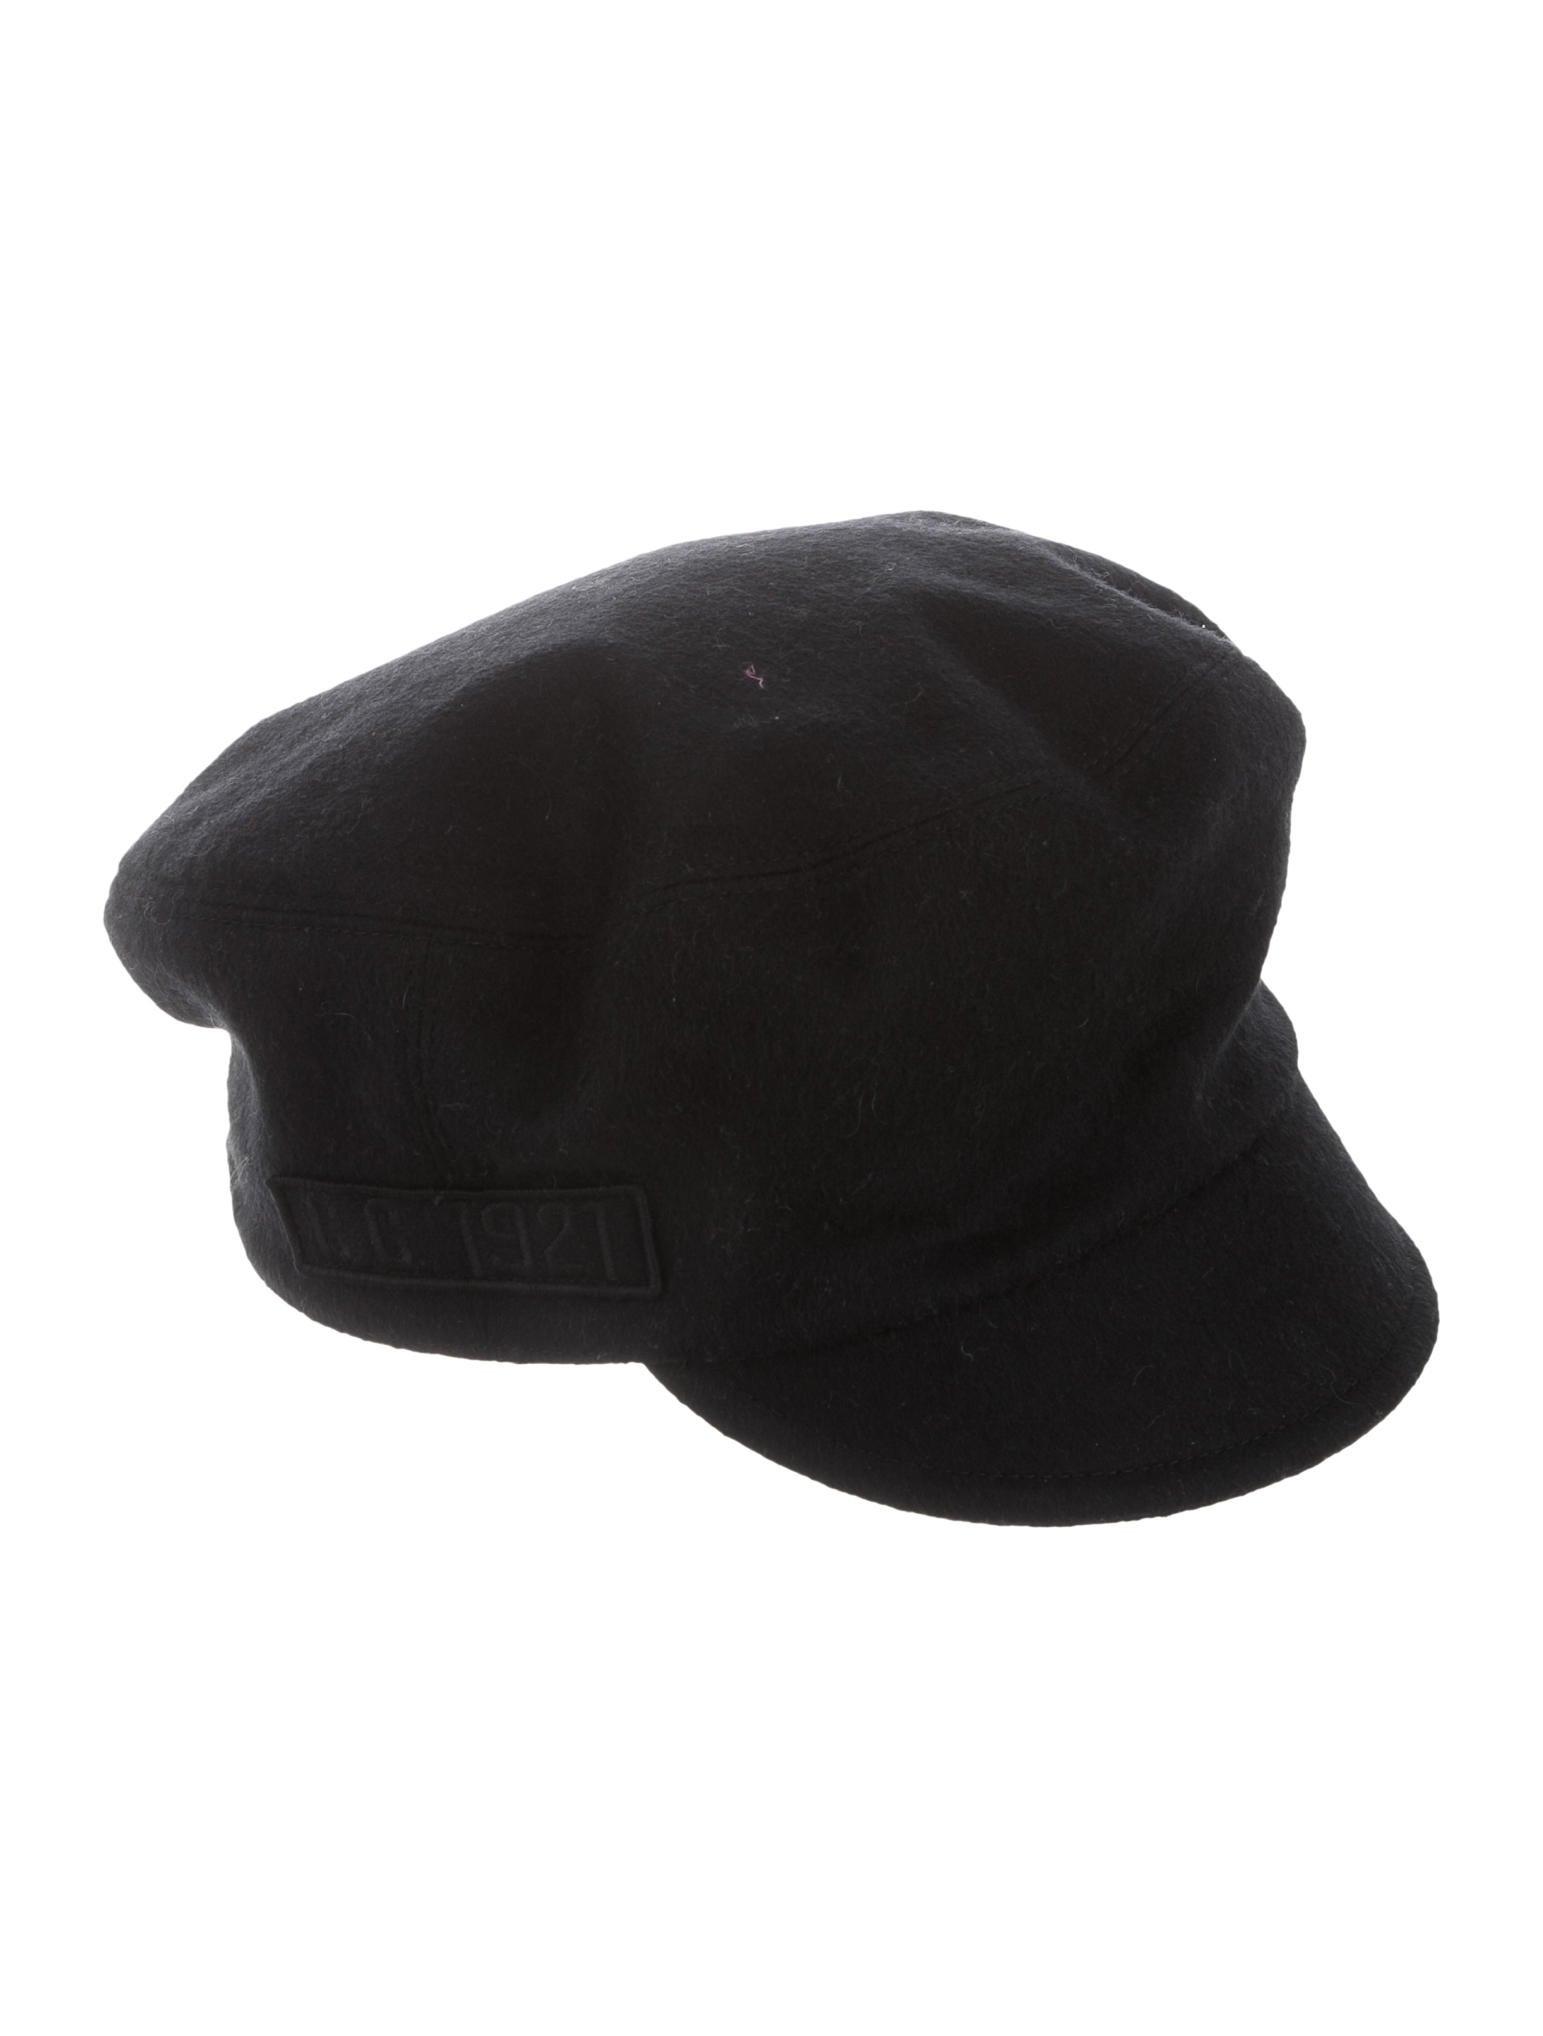 Gucci Wool Military Cap - Accessories - GUC136006  2b3234f3789